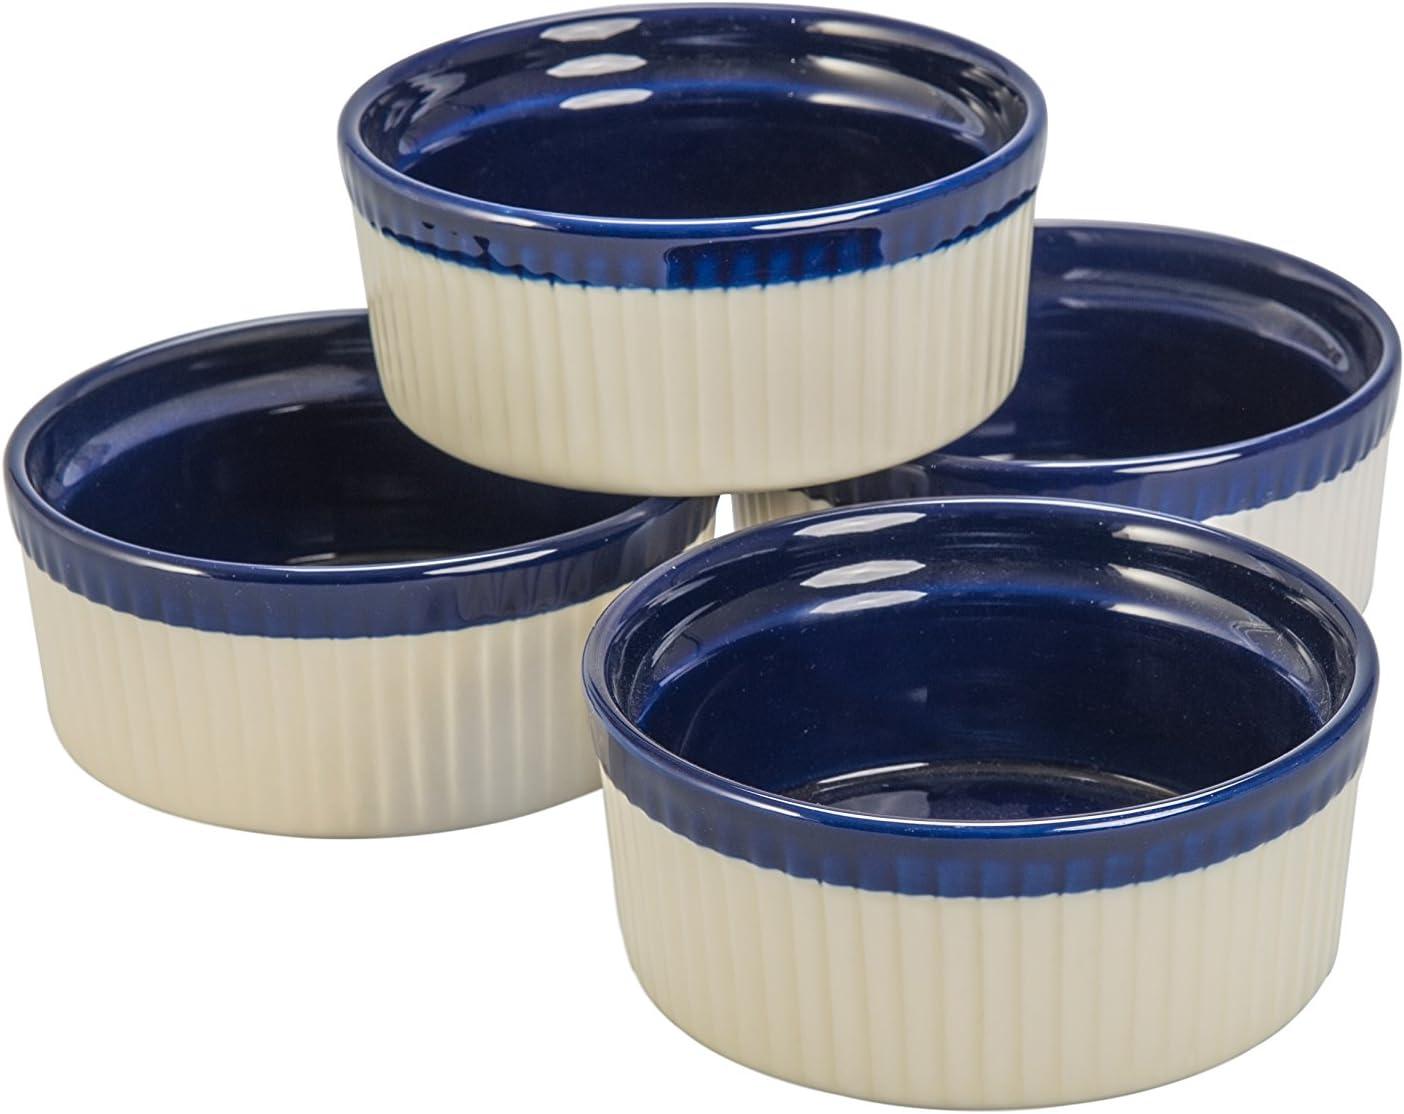 Fort Worth Mall BIA Cordon Bleu Quatro 10-Ounce Soufflé Set Dish of Cob New Free Shipping 4 Sand